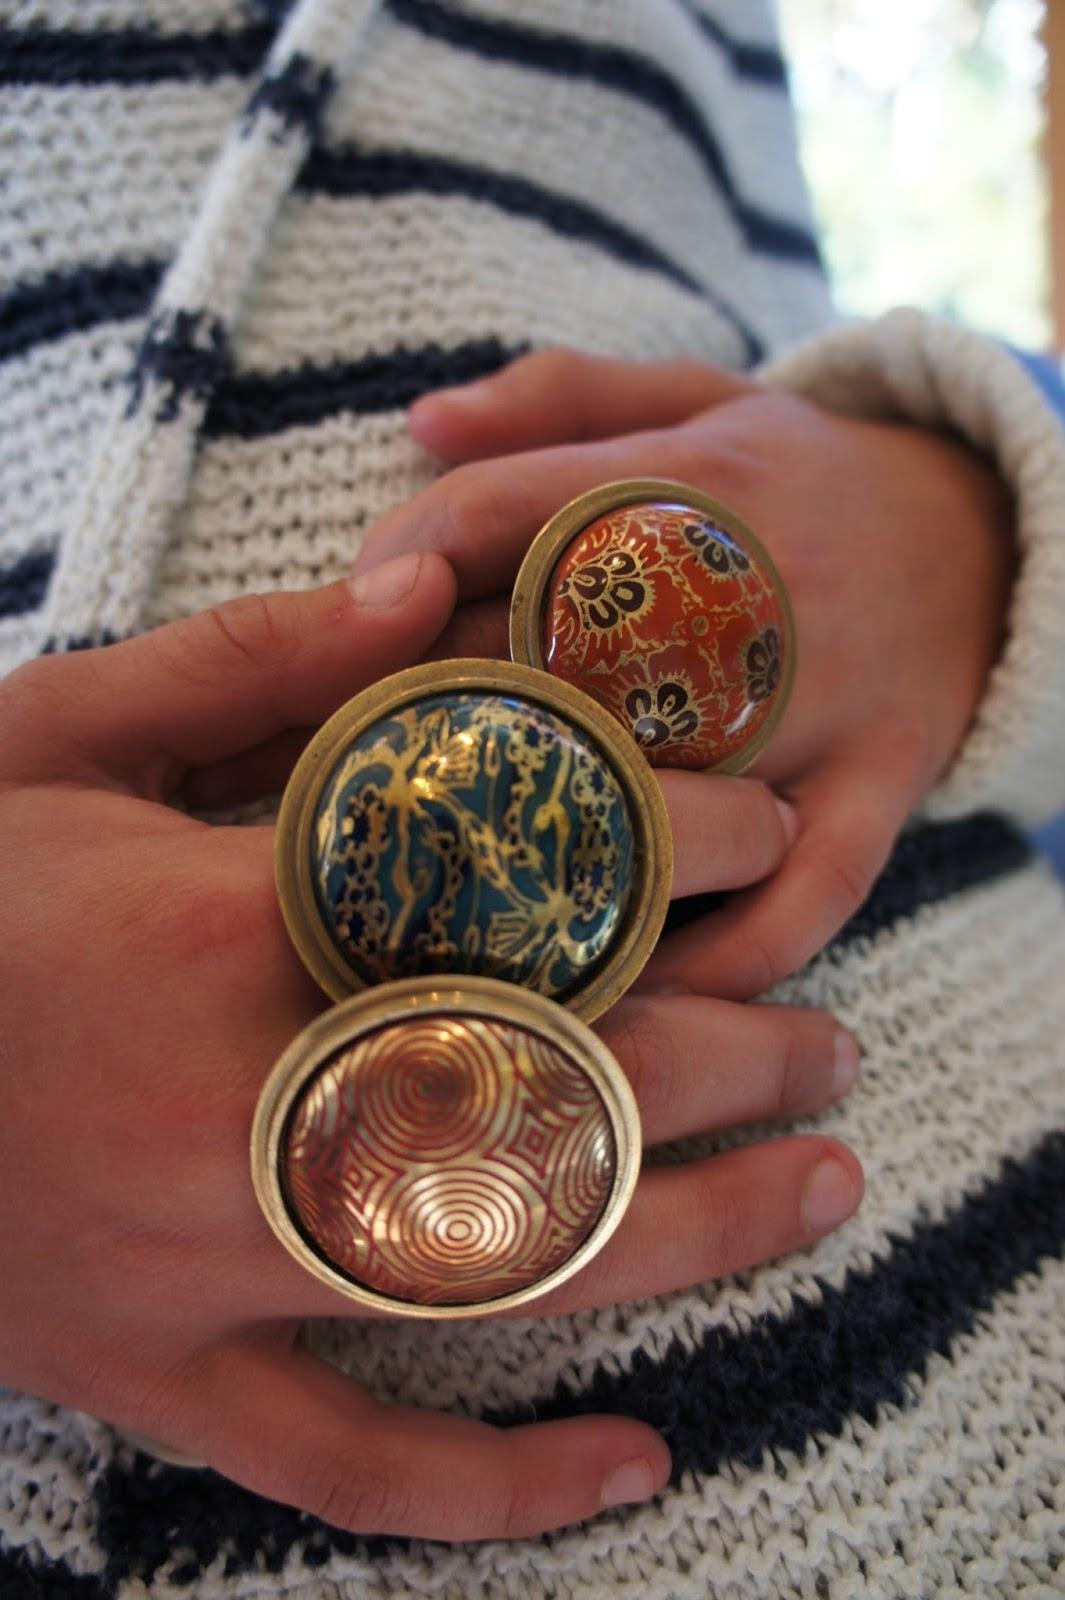 2013-02-16-rings.jpeg